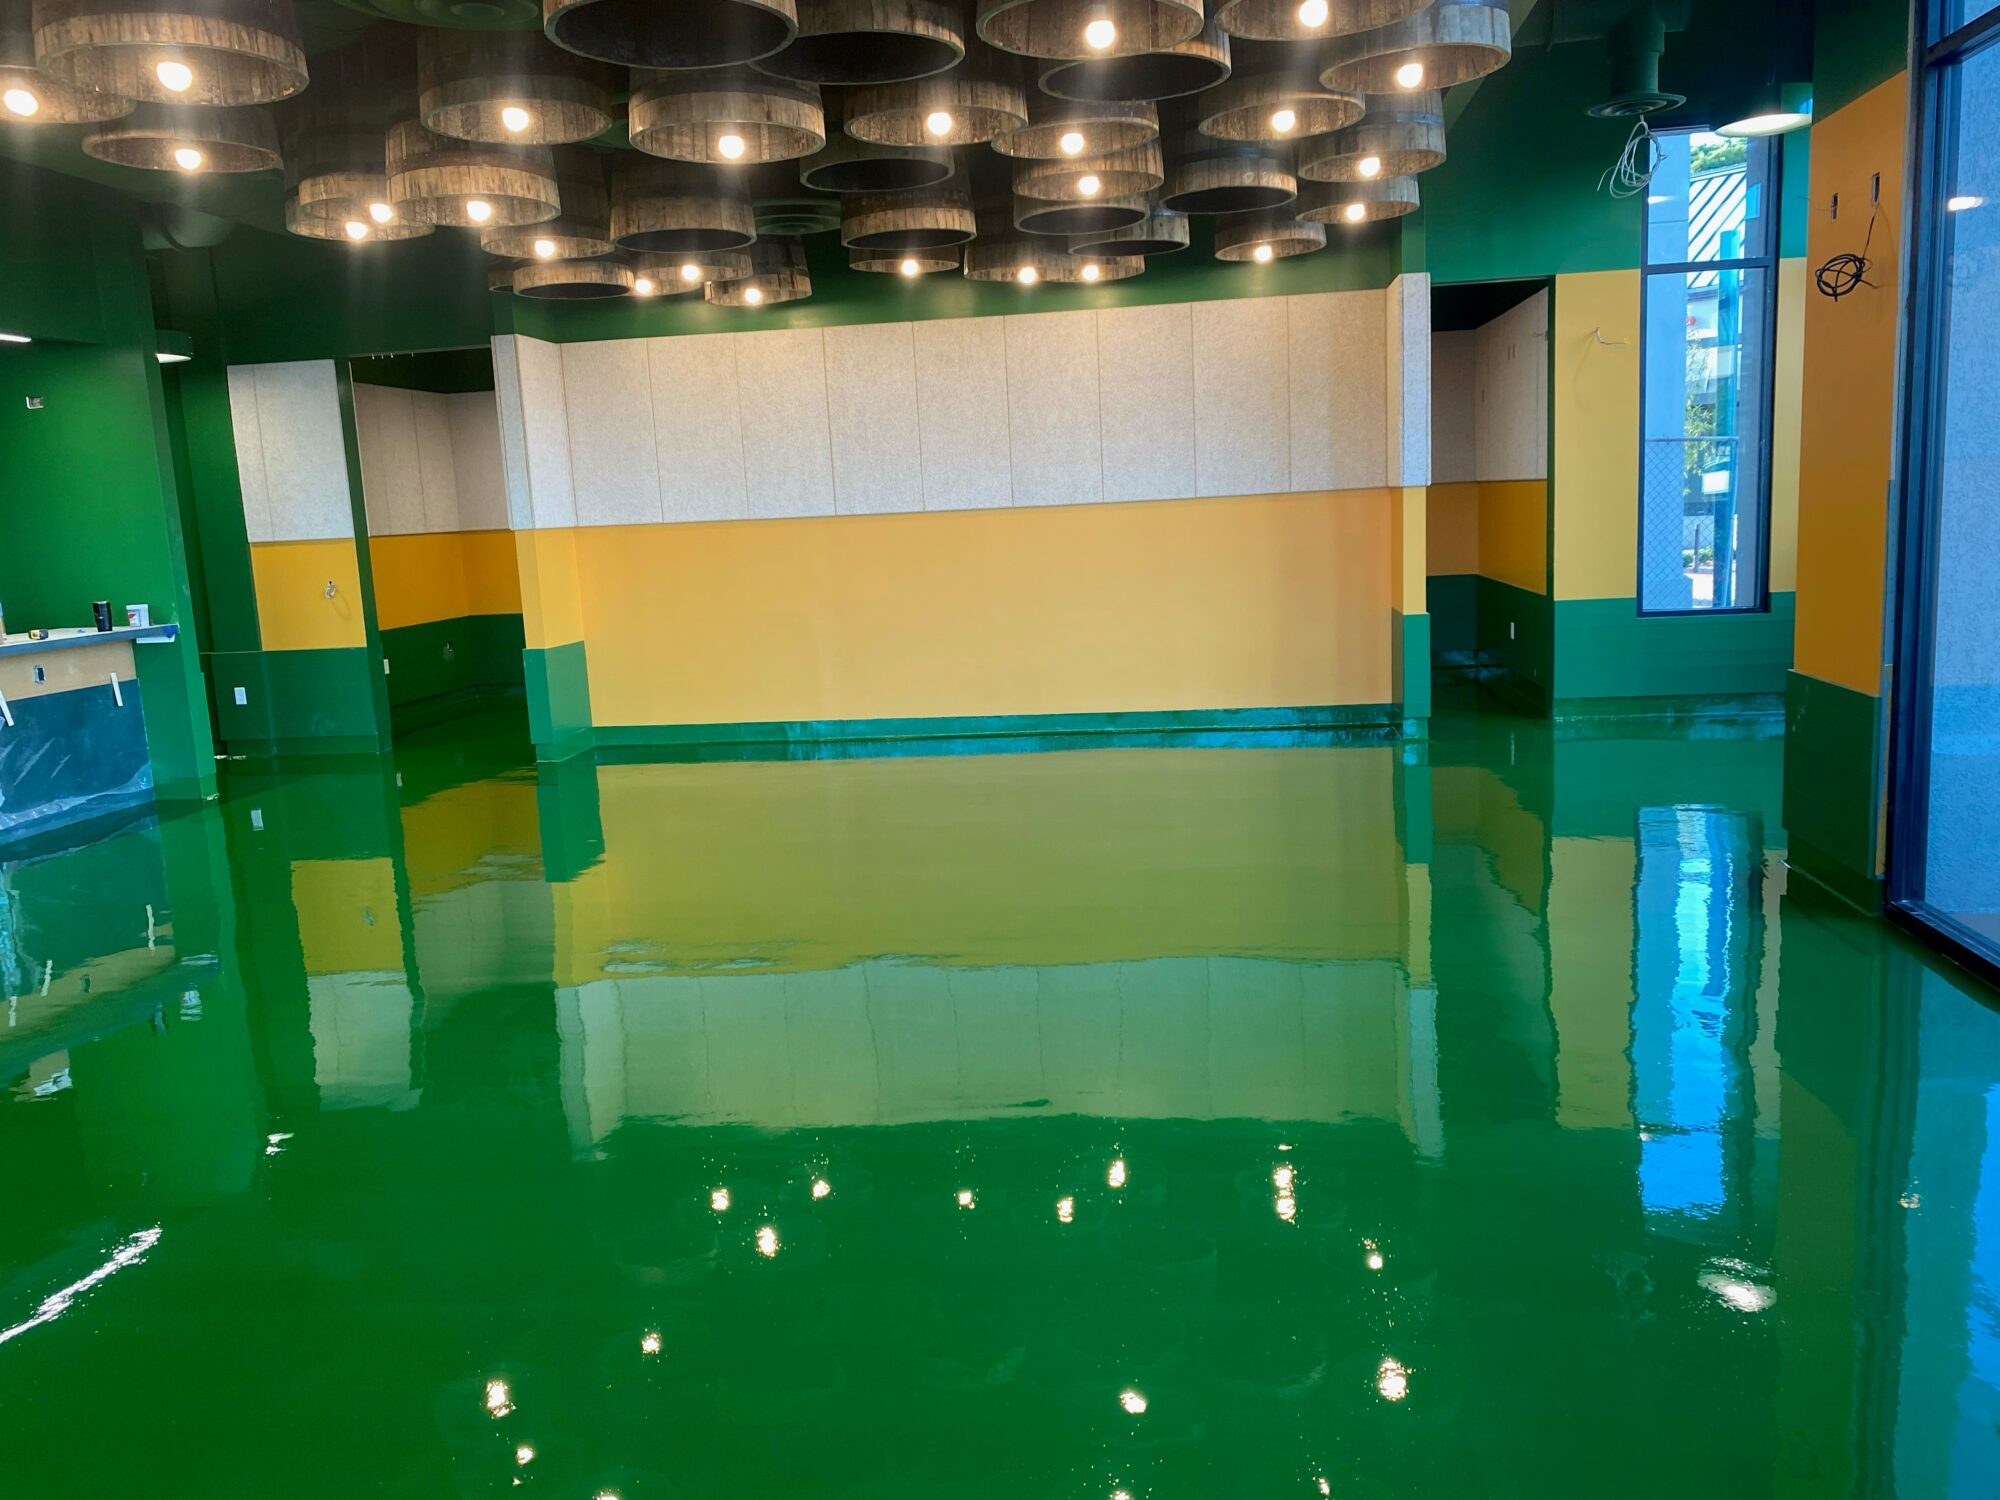 concrete floor coatings, epoxy floor coatings, Industrial Applications Inc, usda approved coatings, commerical kitchen flooring, restaurant epoxy flooring, TeamIA